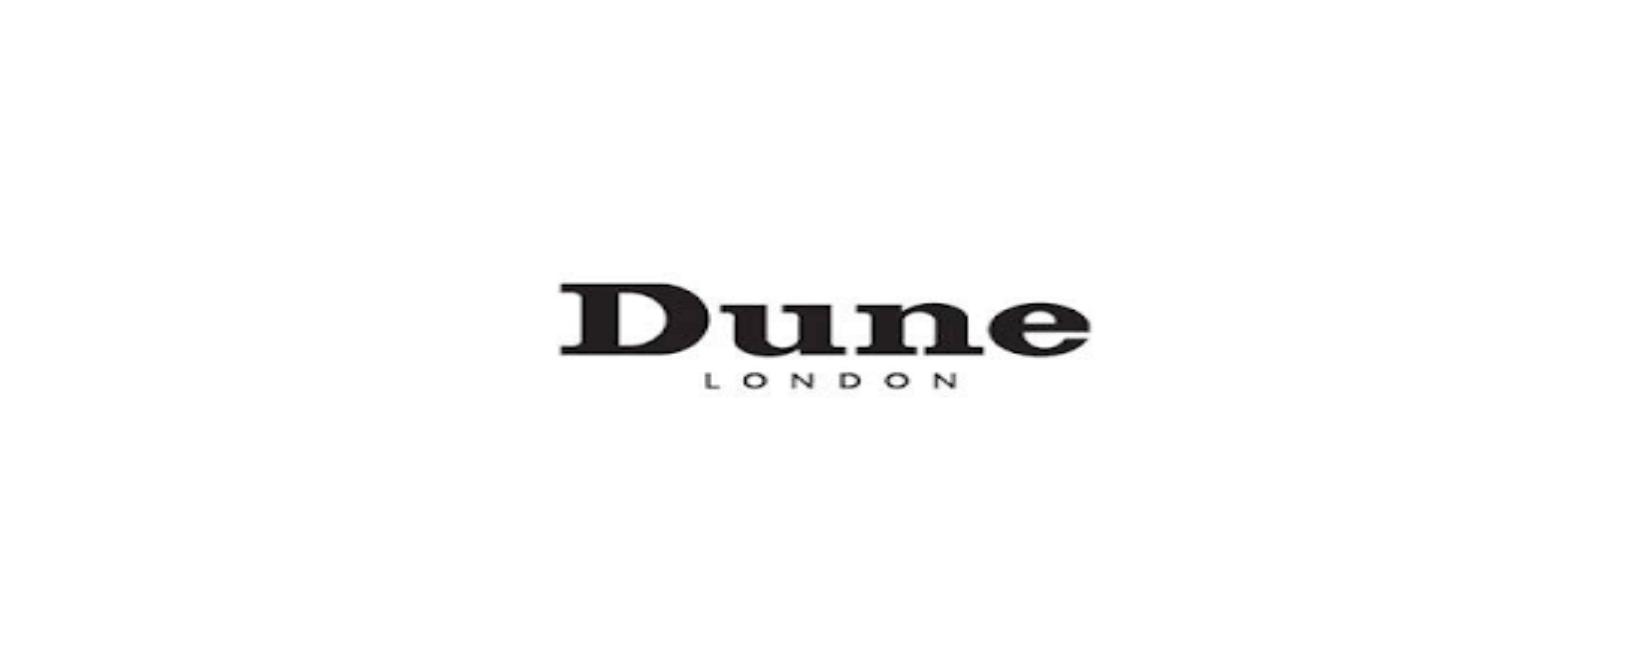 Dune London AU Discount Code 2021